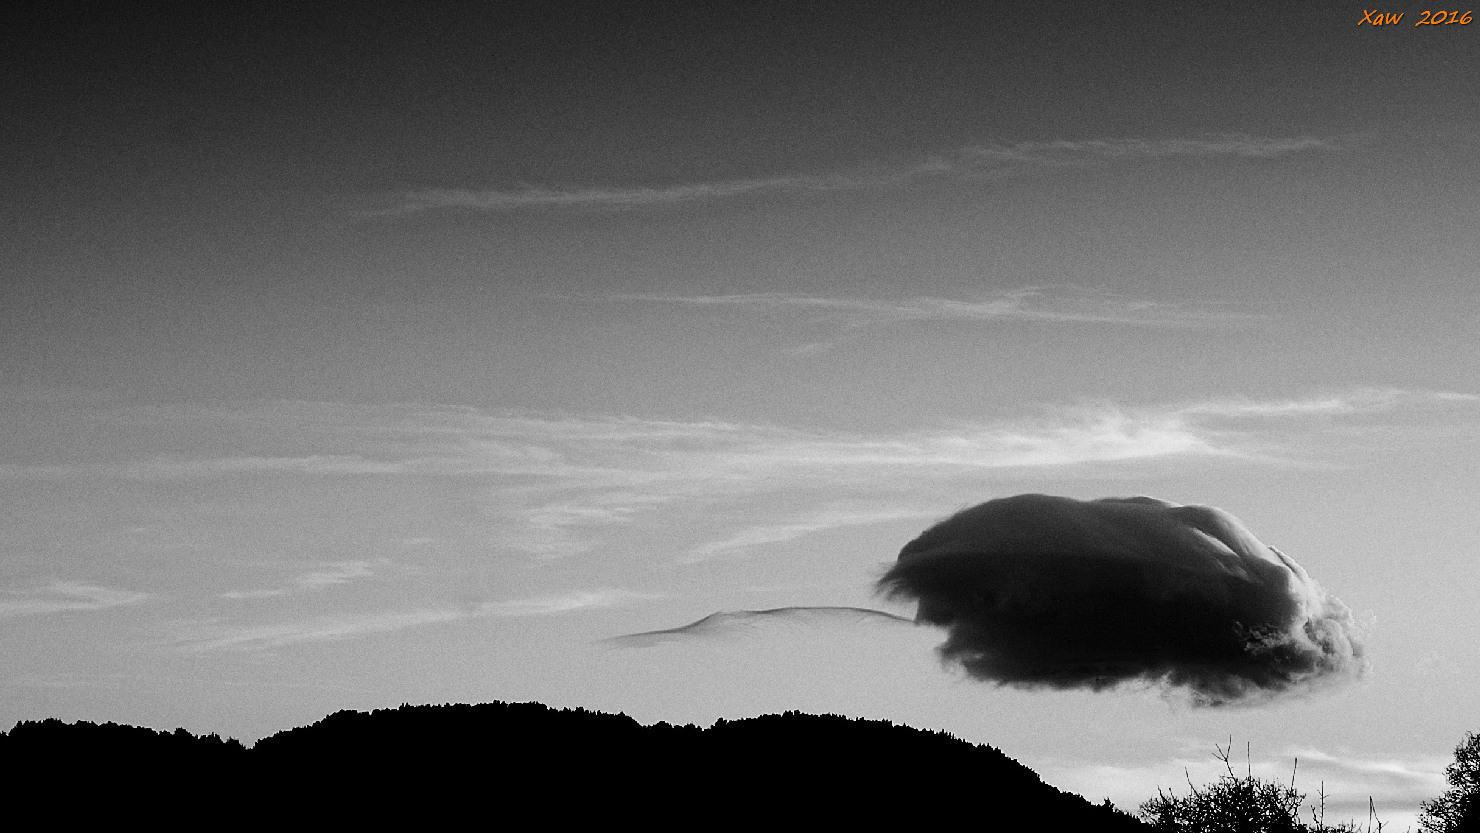 nuvola & coda...